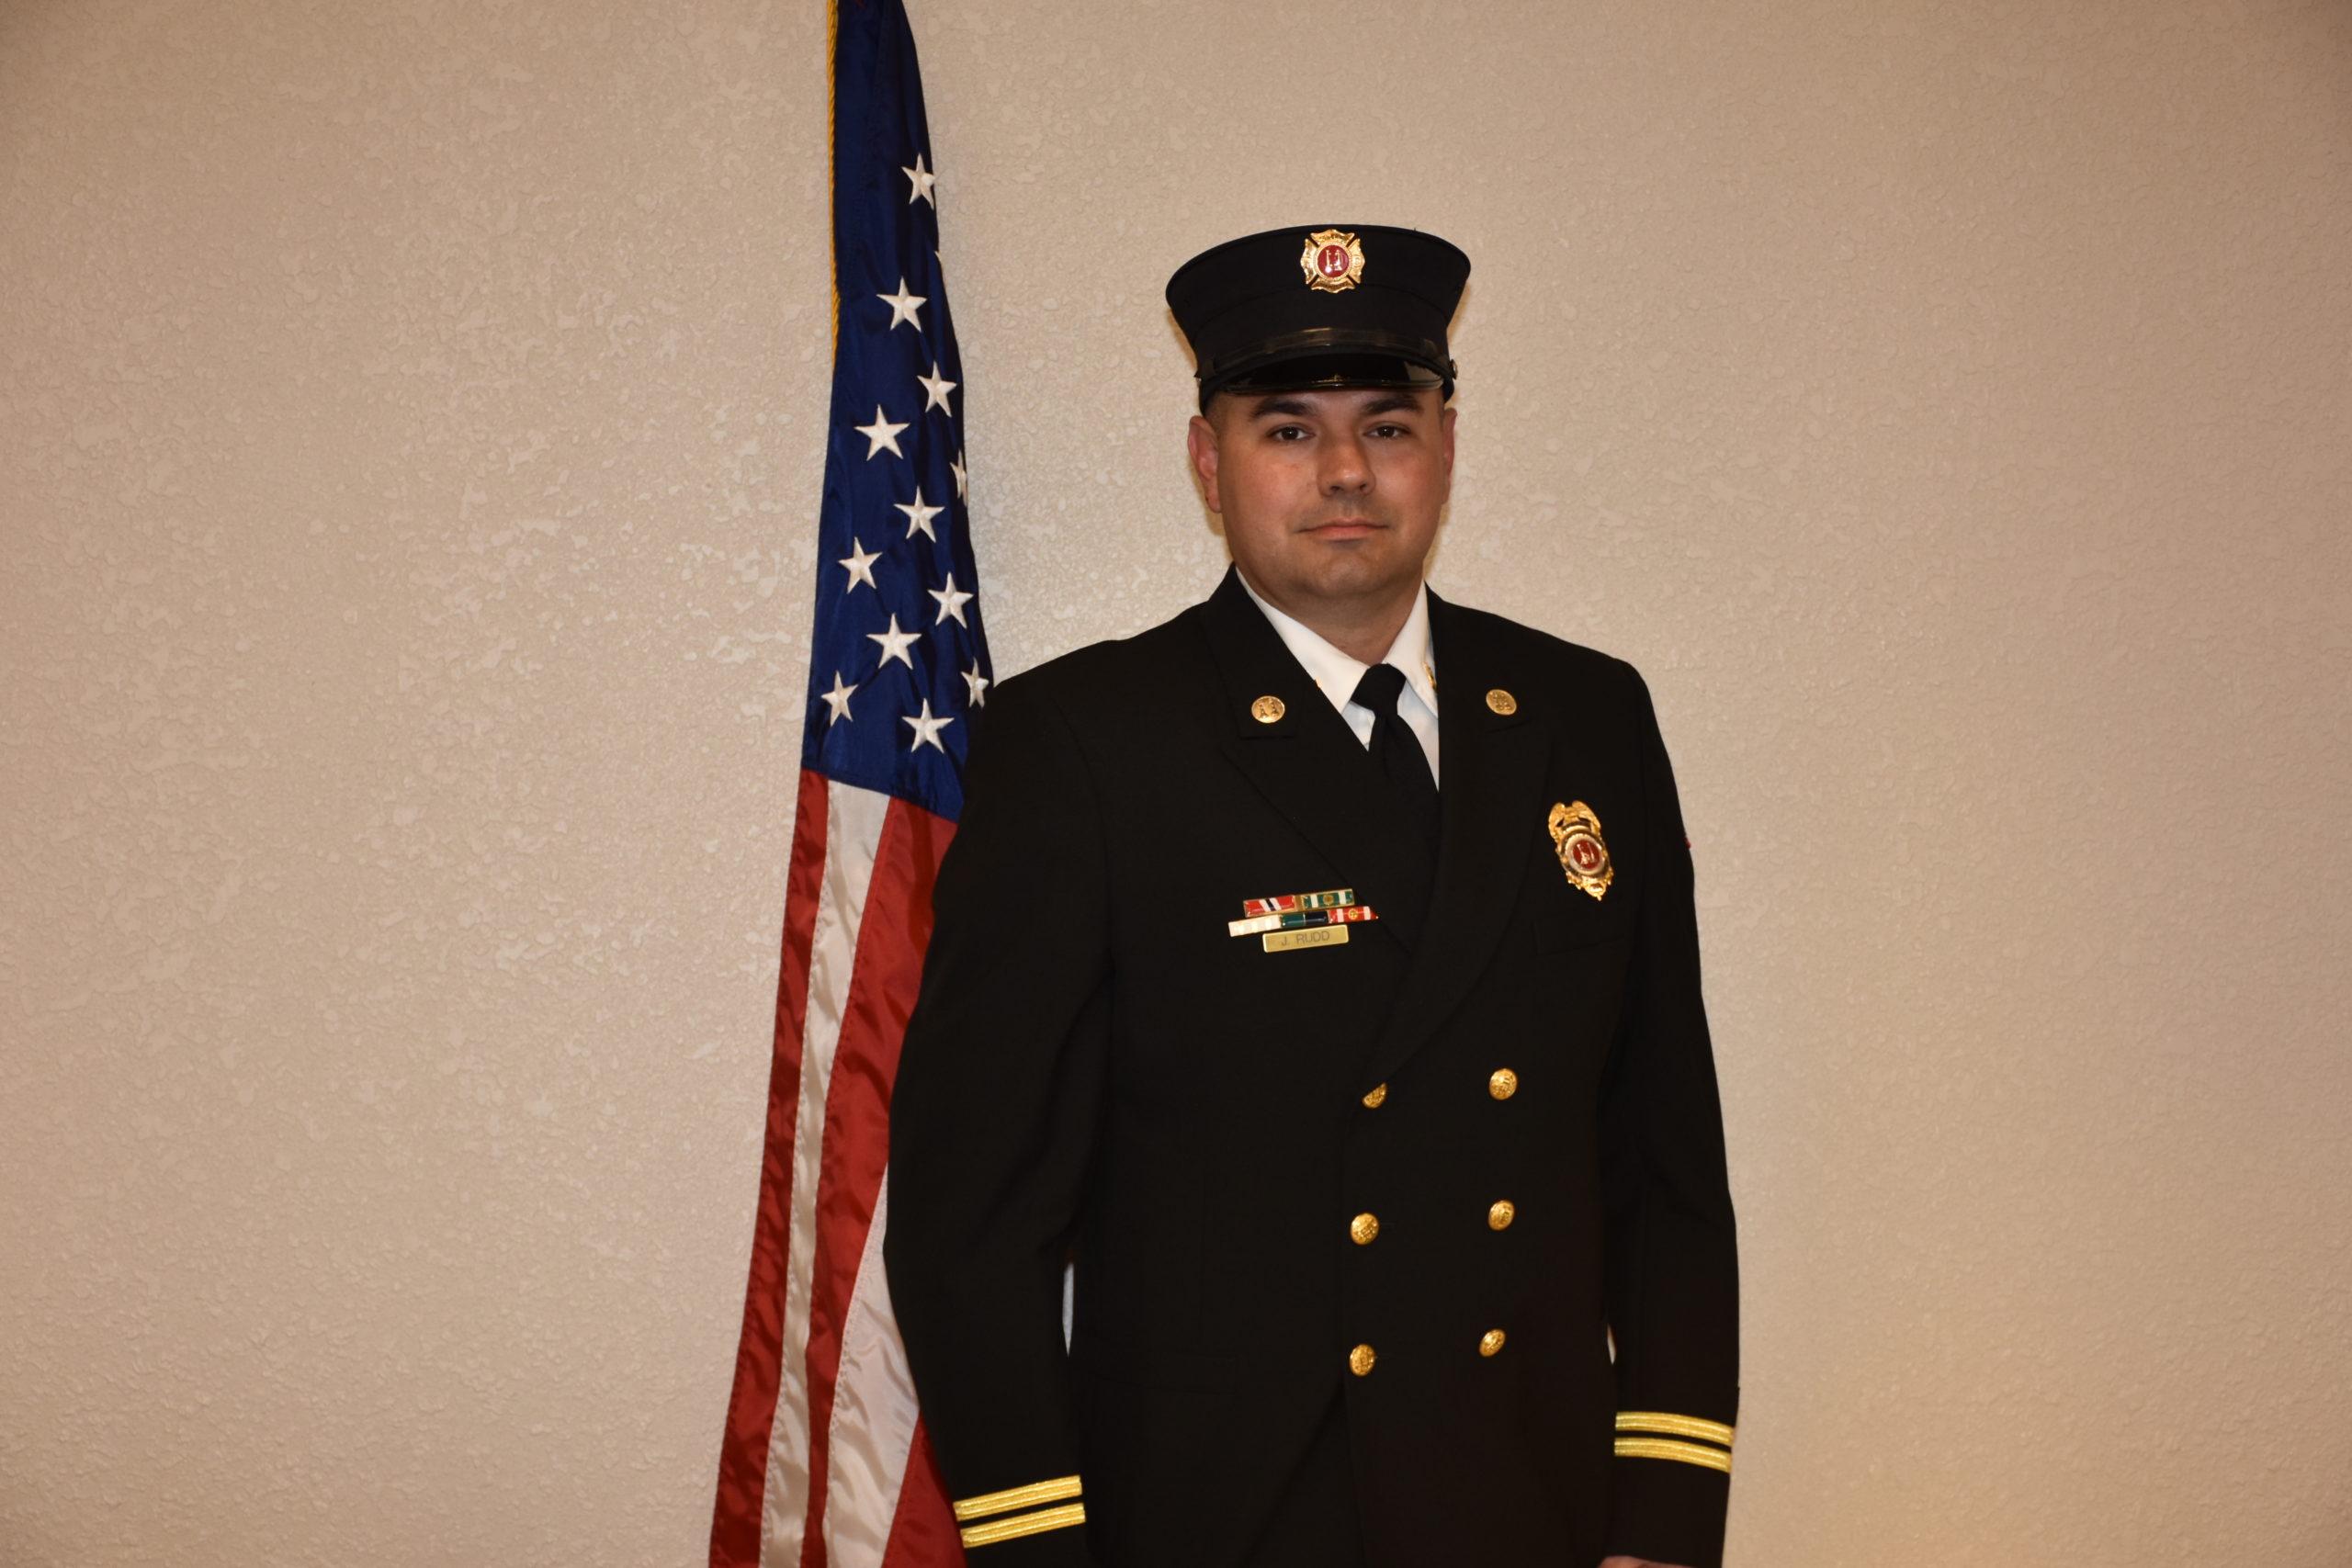 Glenn Heights Fire Captain Justin Rudd